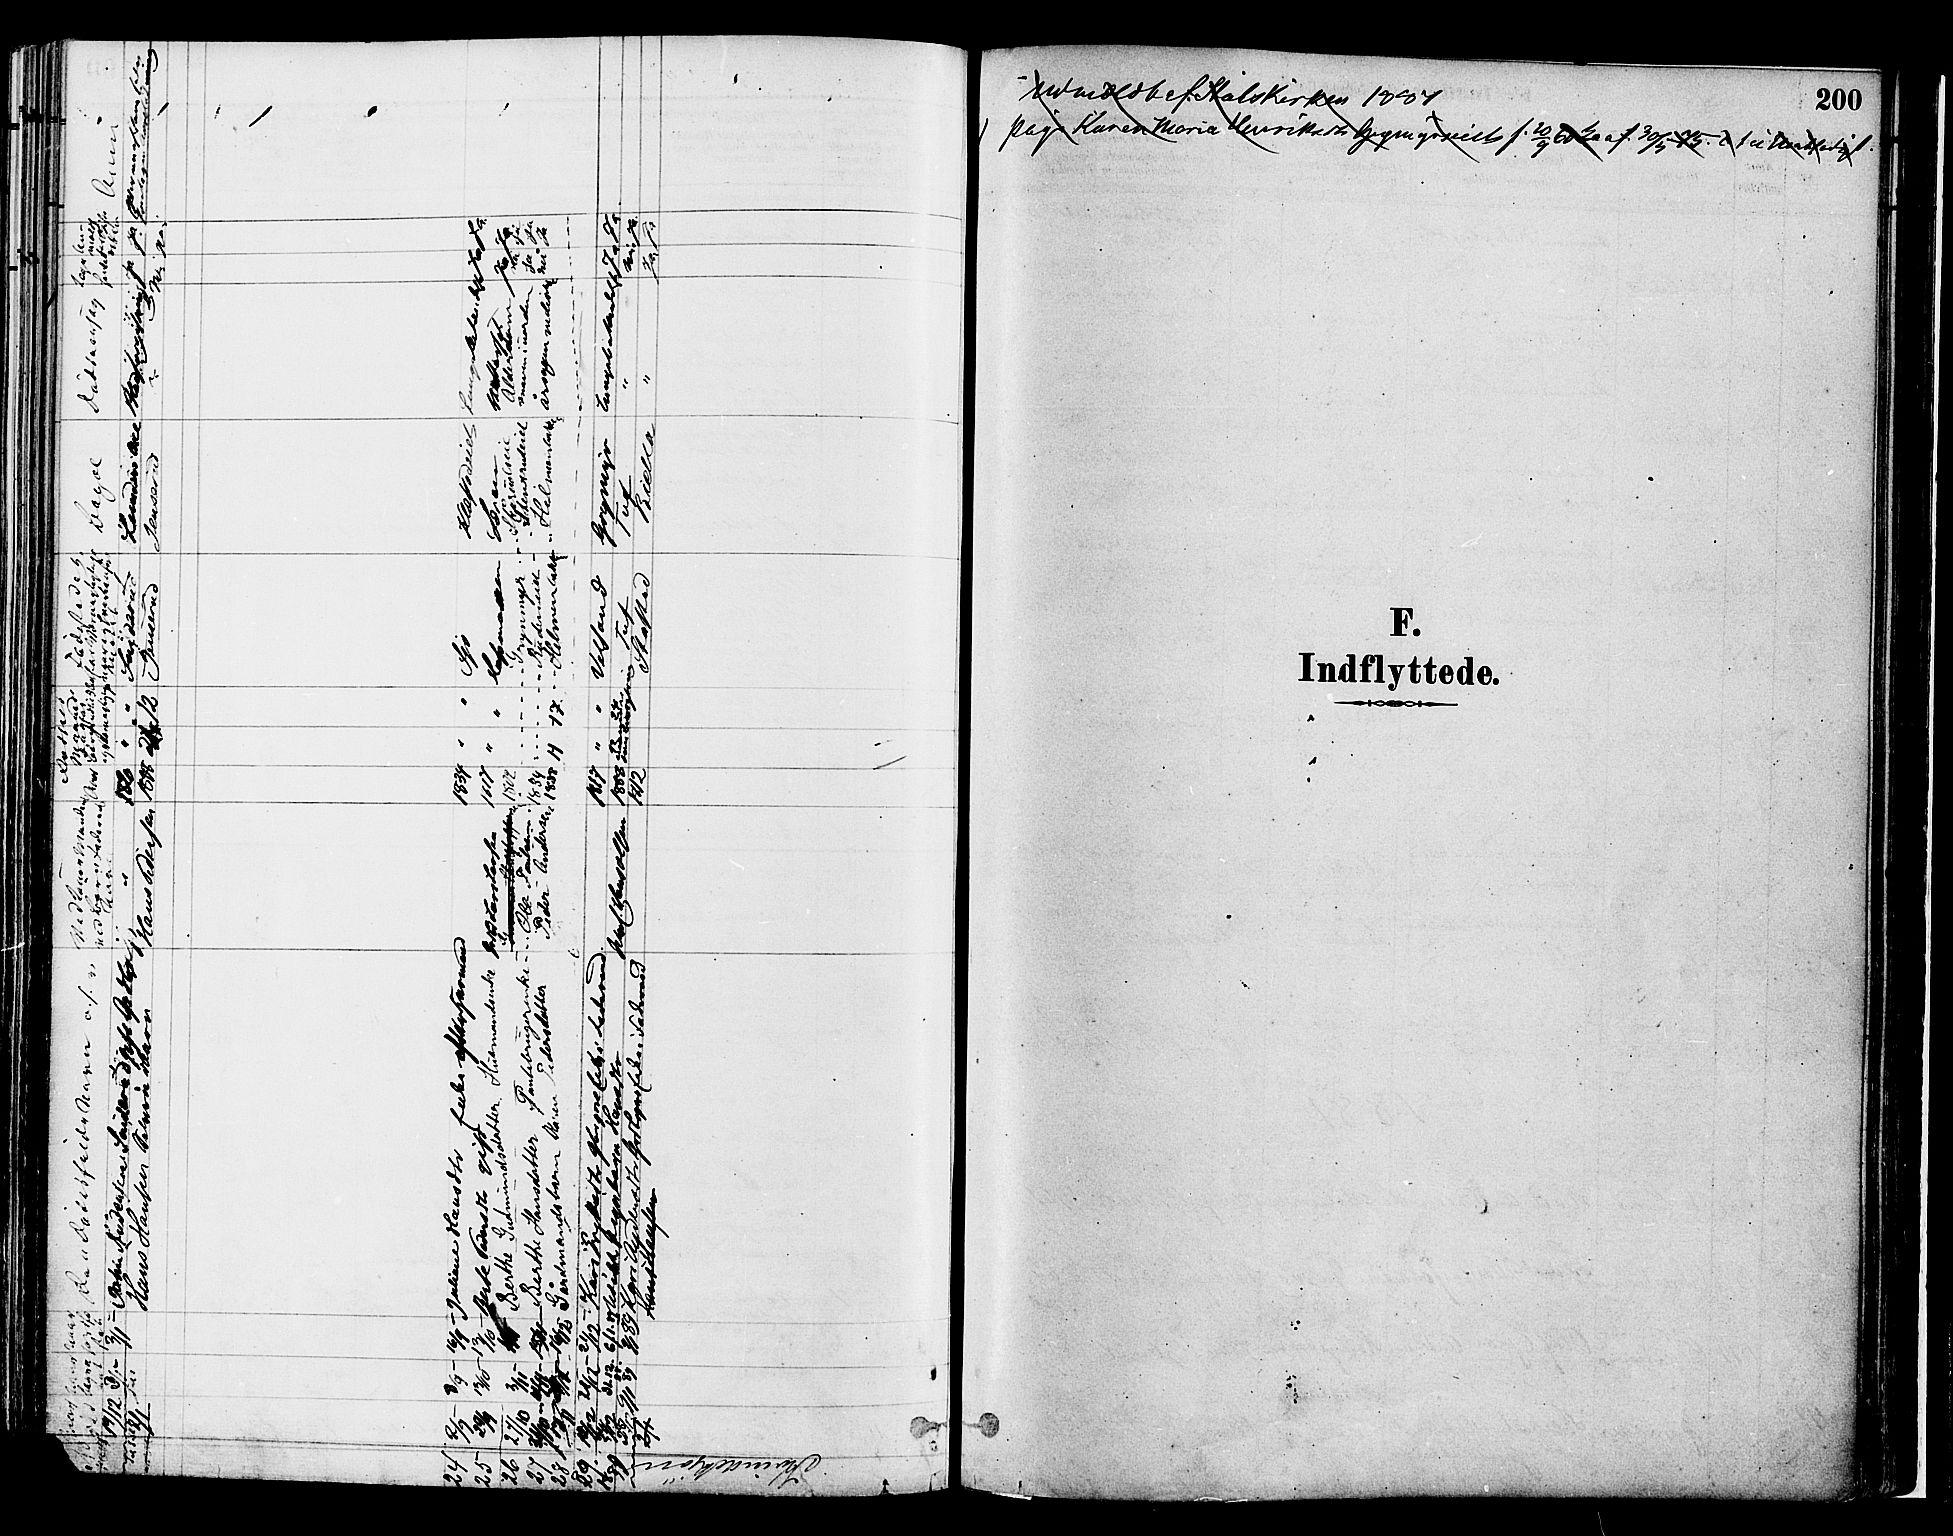 SAH, Gran prestekontor, Ministerialbok nr. 14, 1880-1889, s. 200